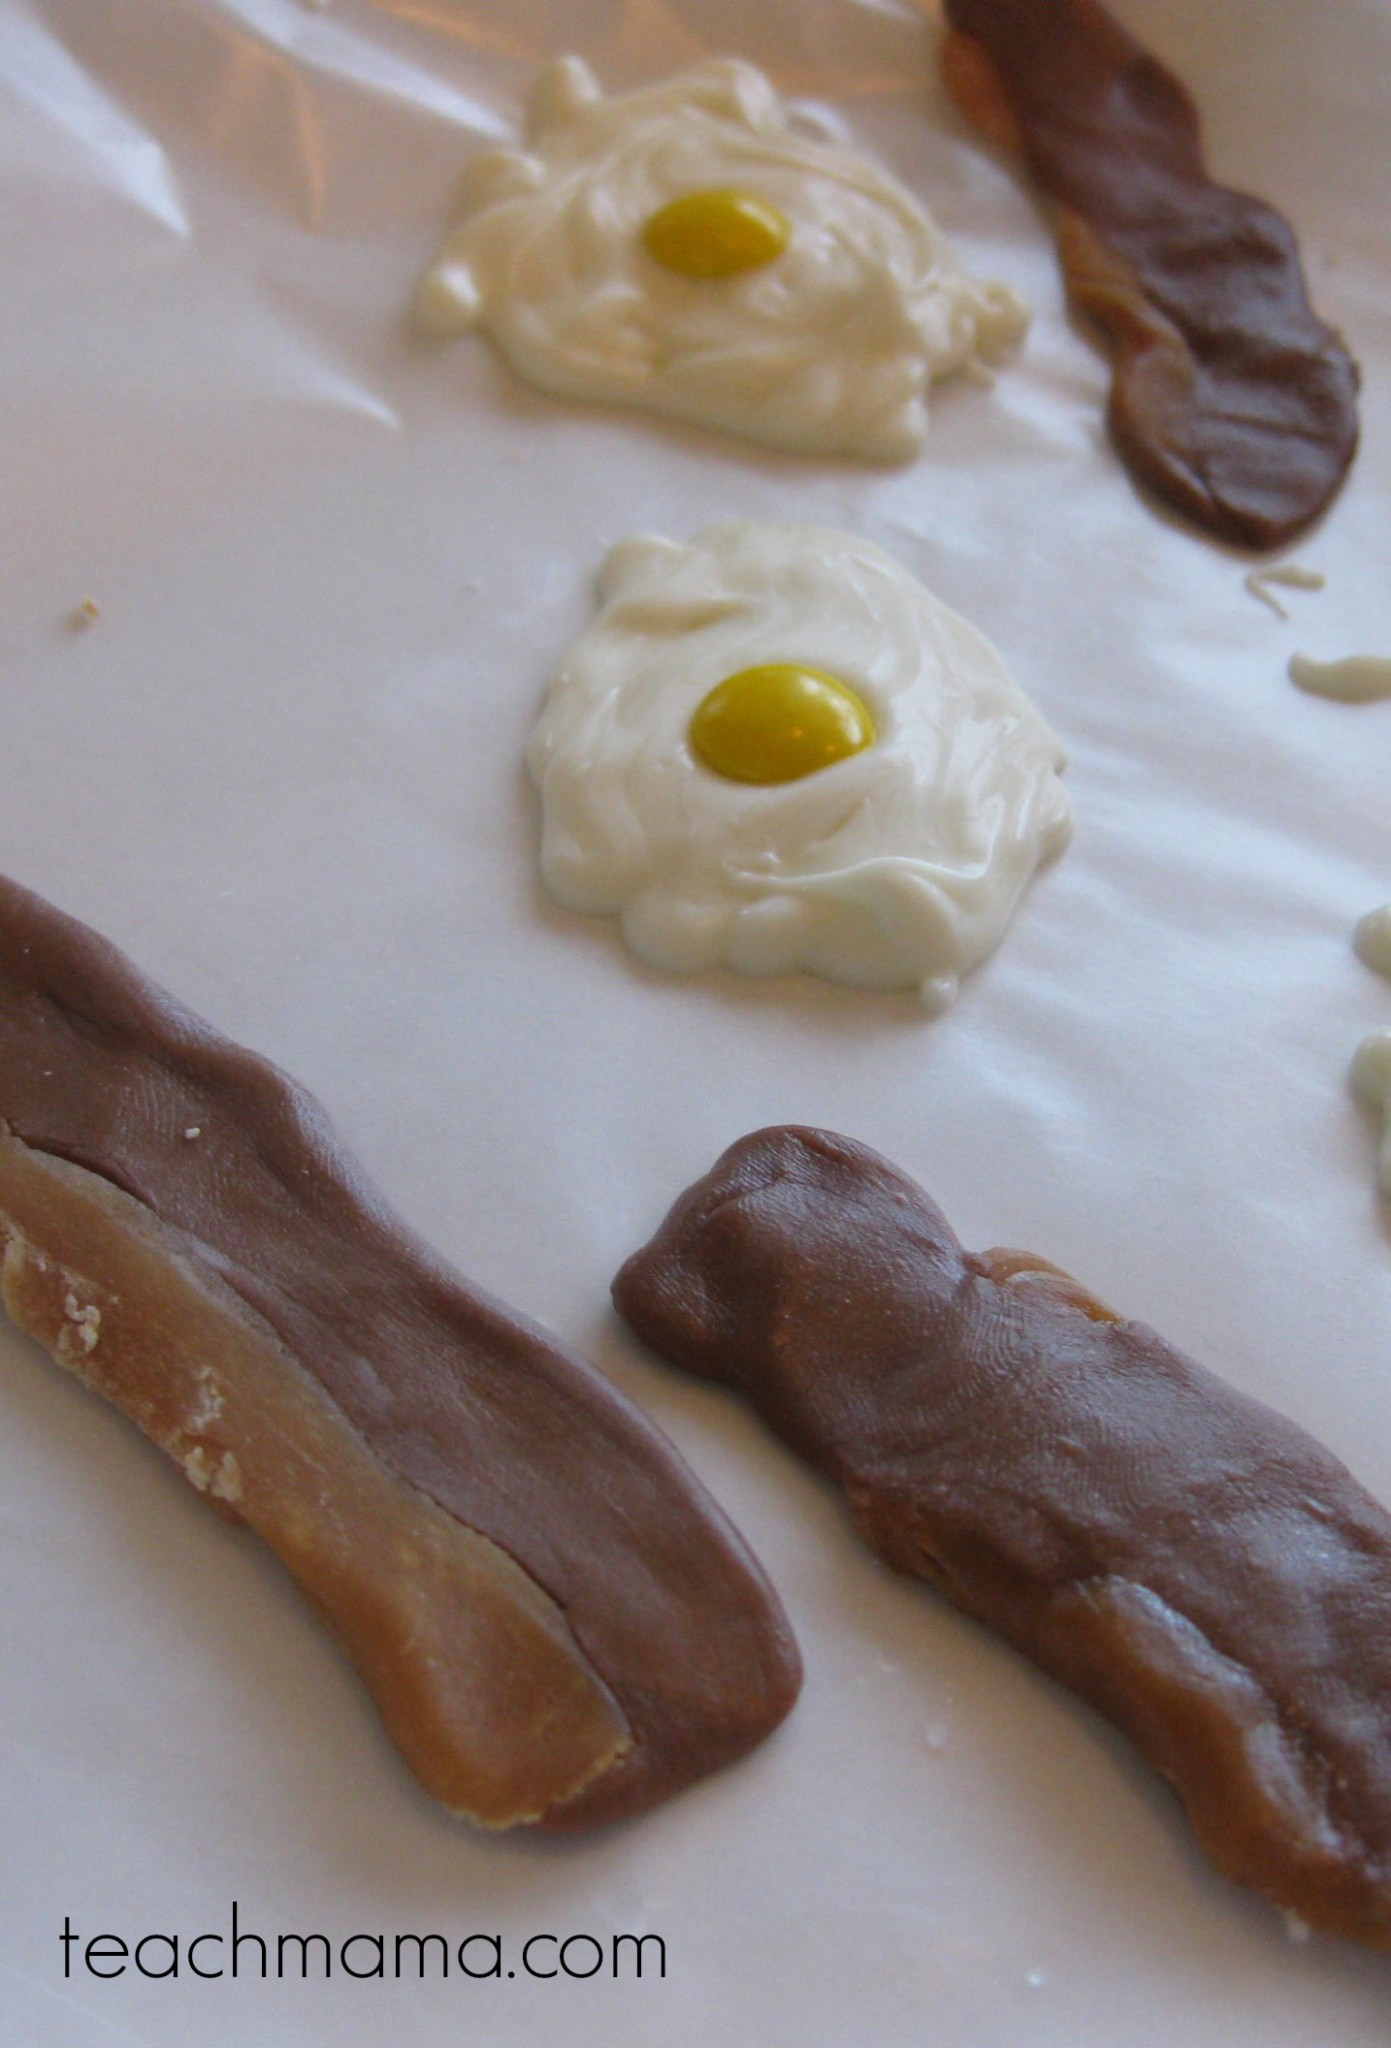 april fools eggs and bacon: teachmama.com